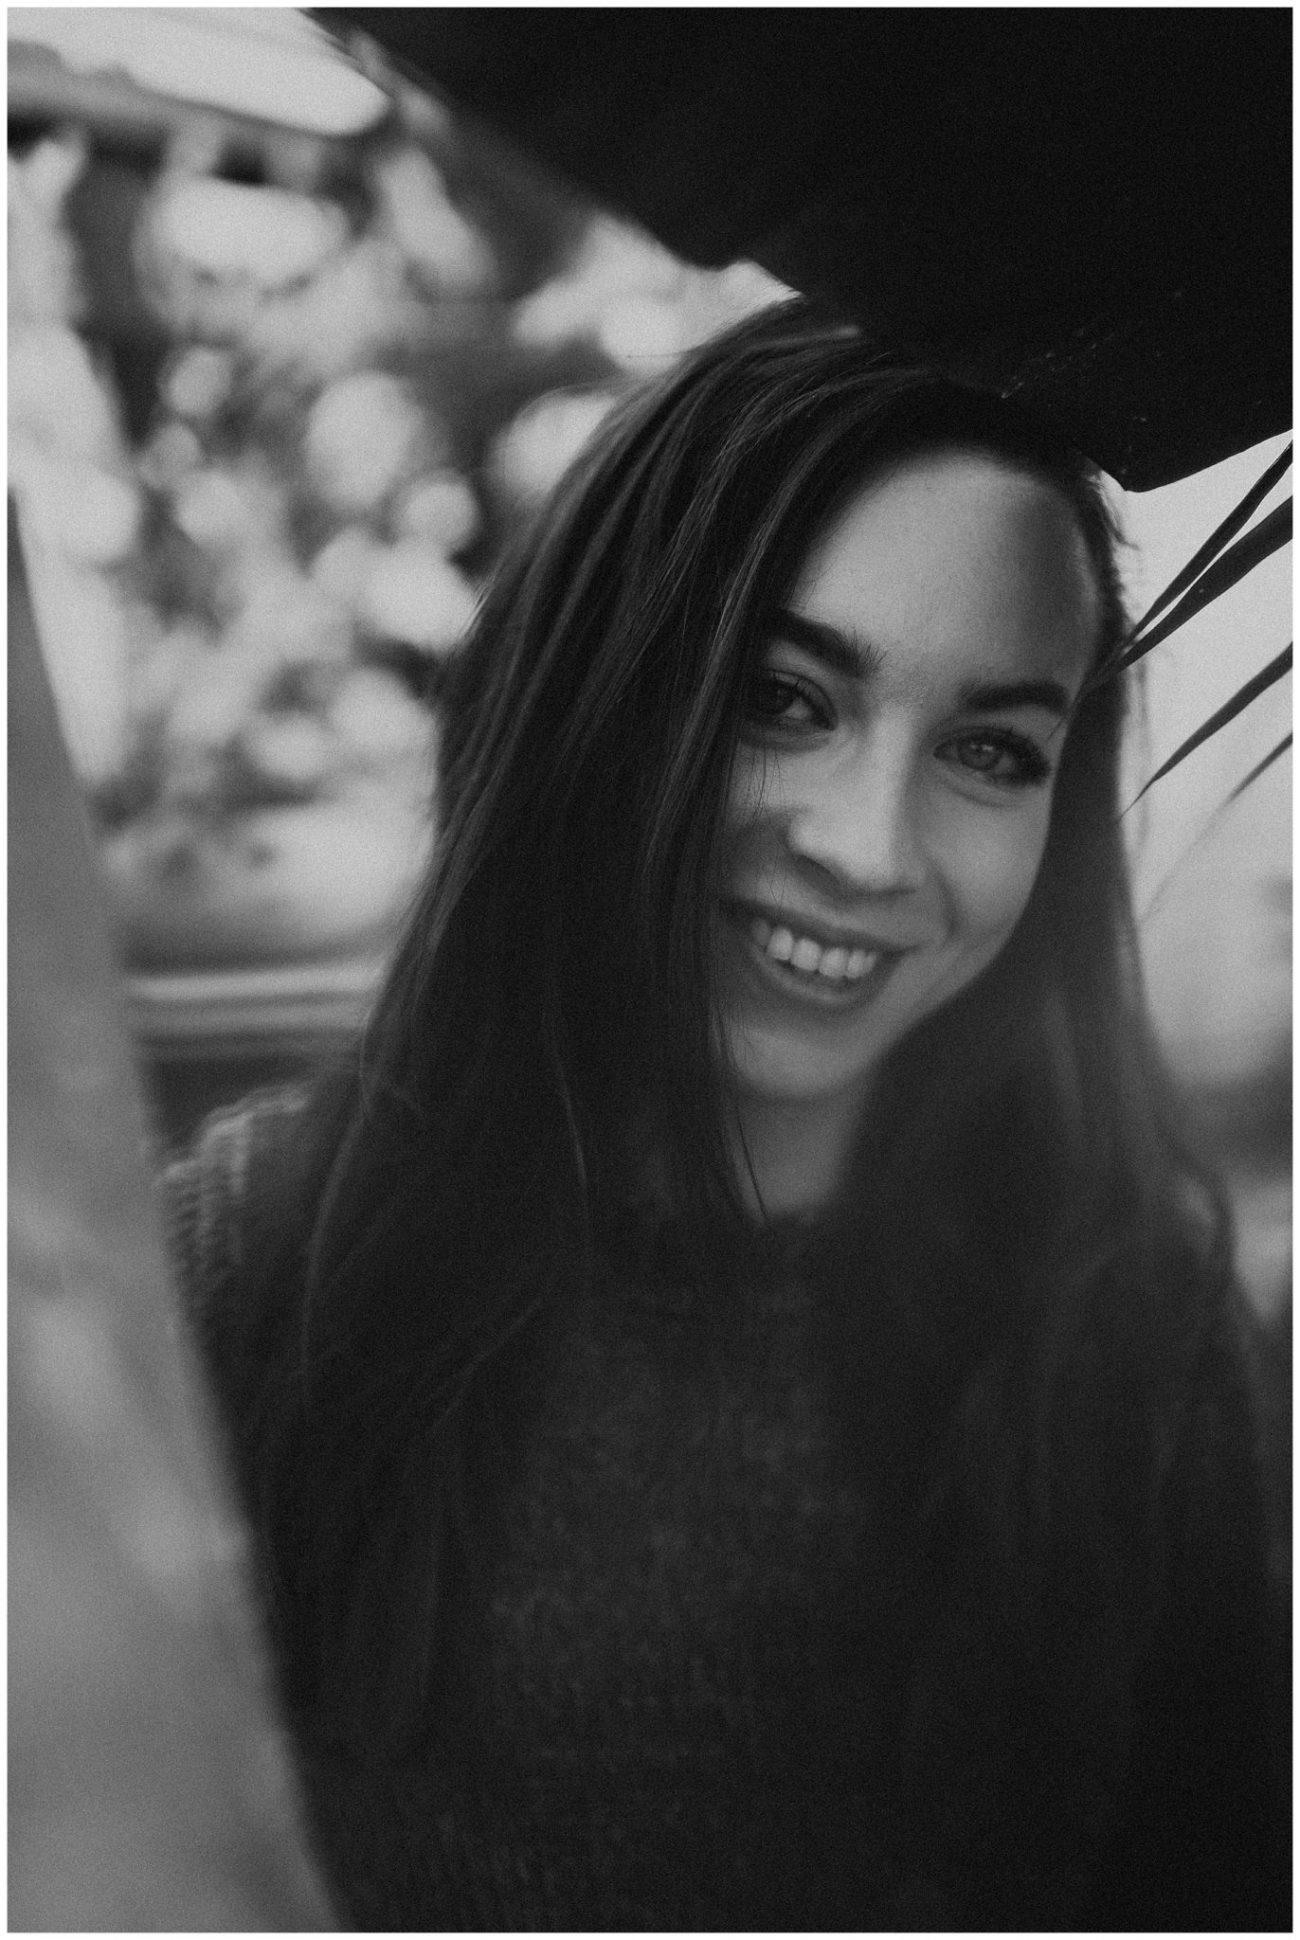 Sabrina    Candid Portraits – Lauren F.otography 9dd0552329f6